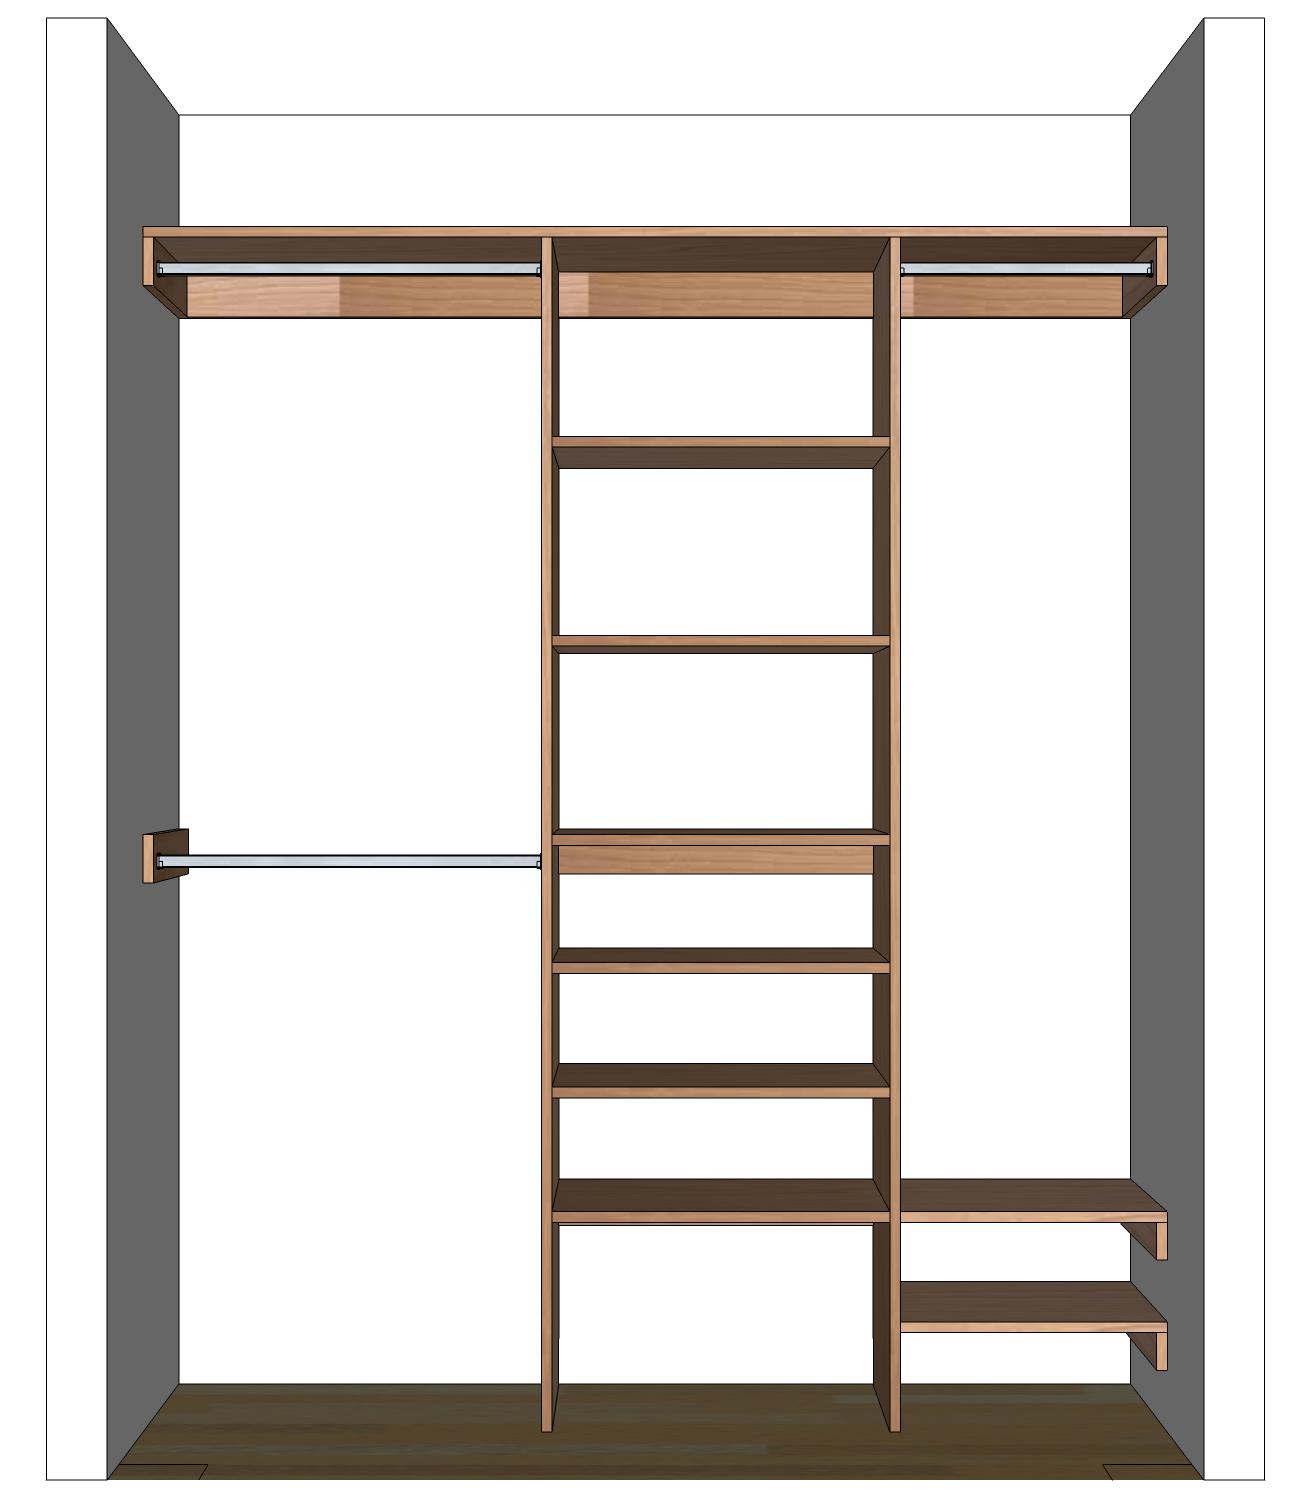 Shoe Shelves For Closet | ... Kits You Can Build All Three Drawers For Our  DIY Closet Organizer